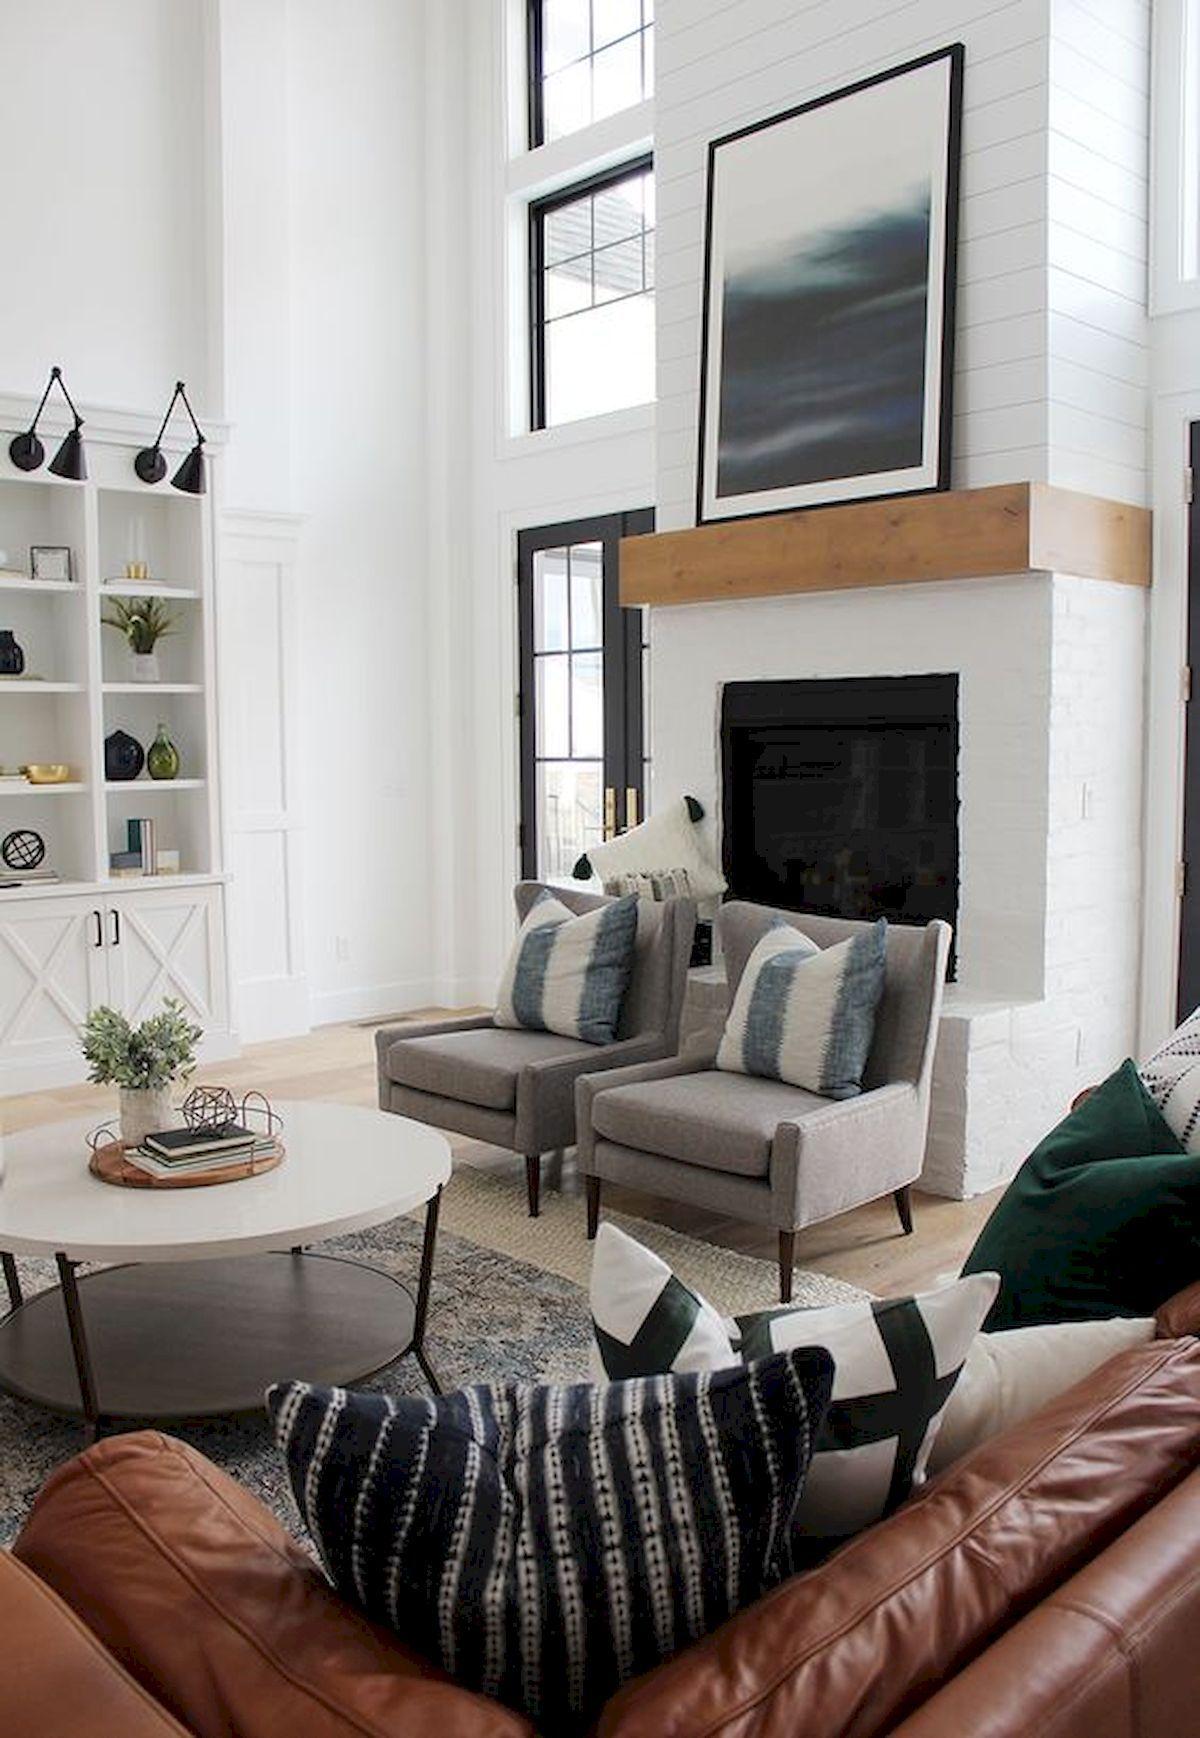 80 Best Furniture For Modern Farmhouse Living Room Decor Ideas images